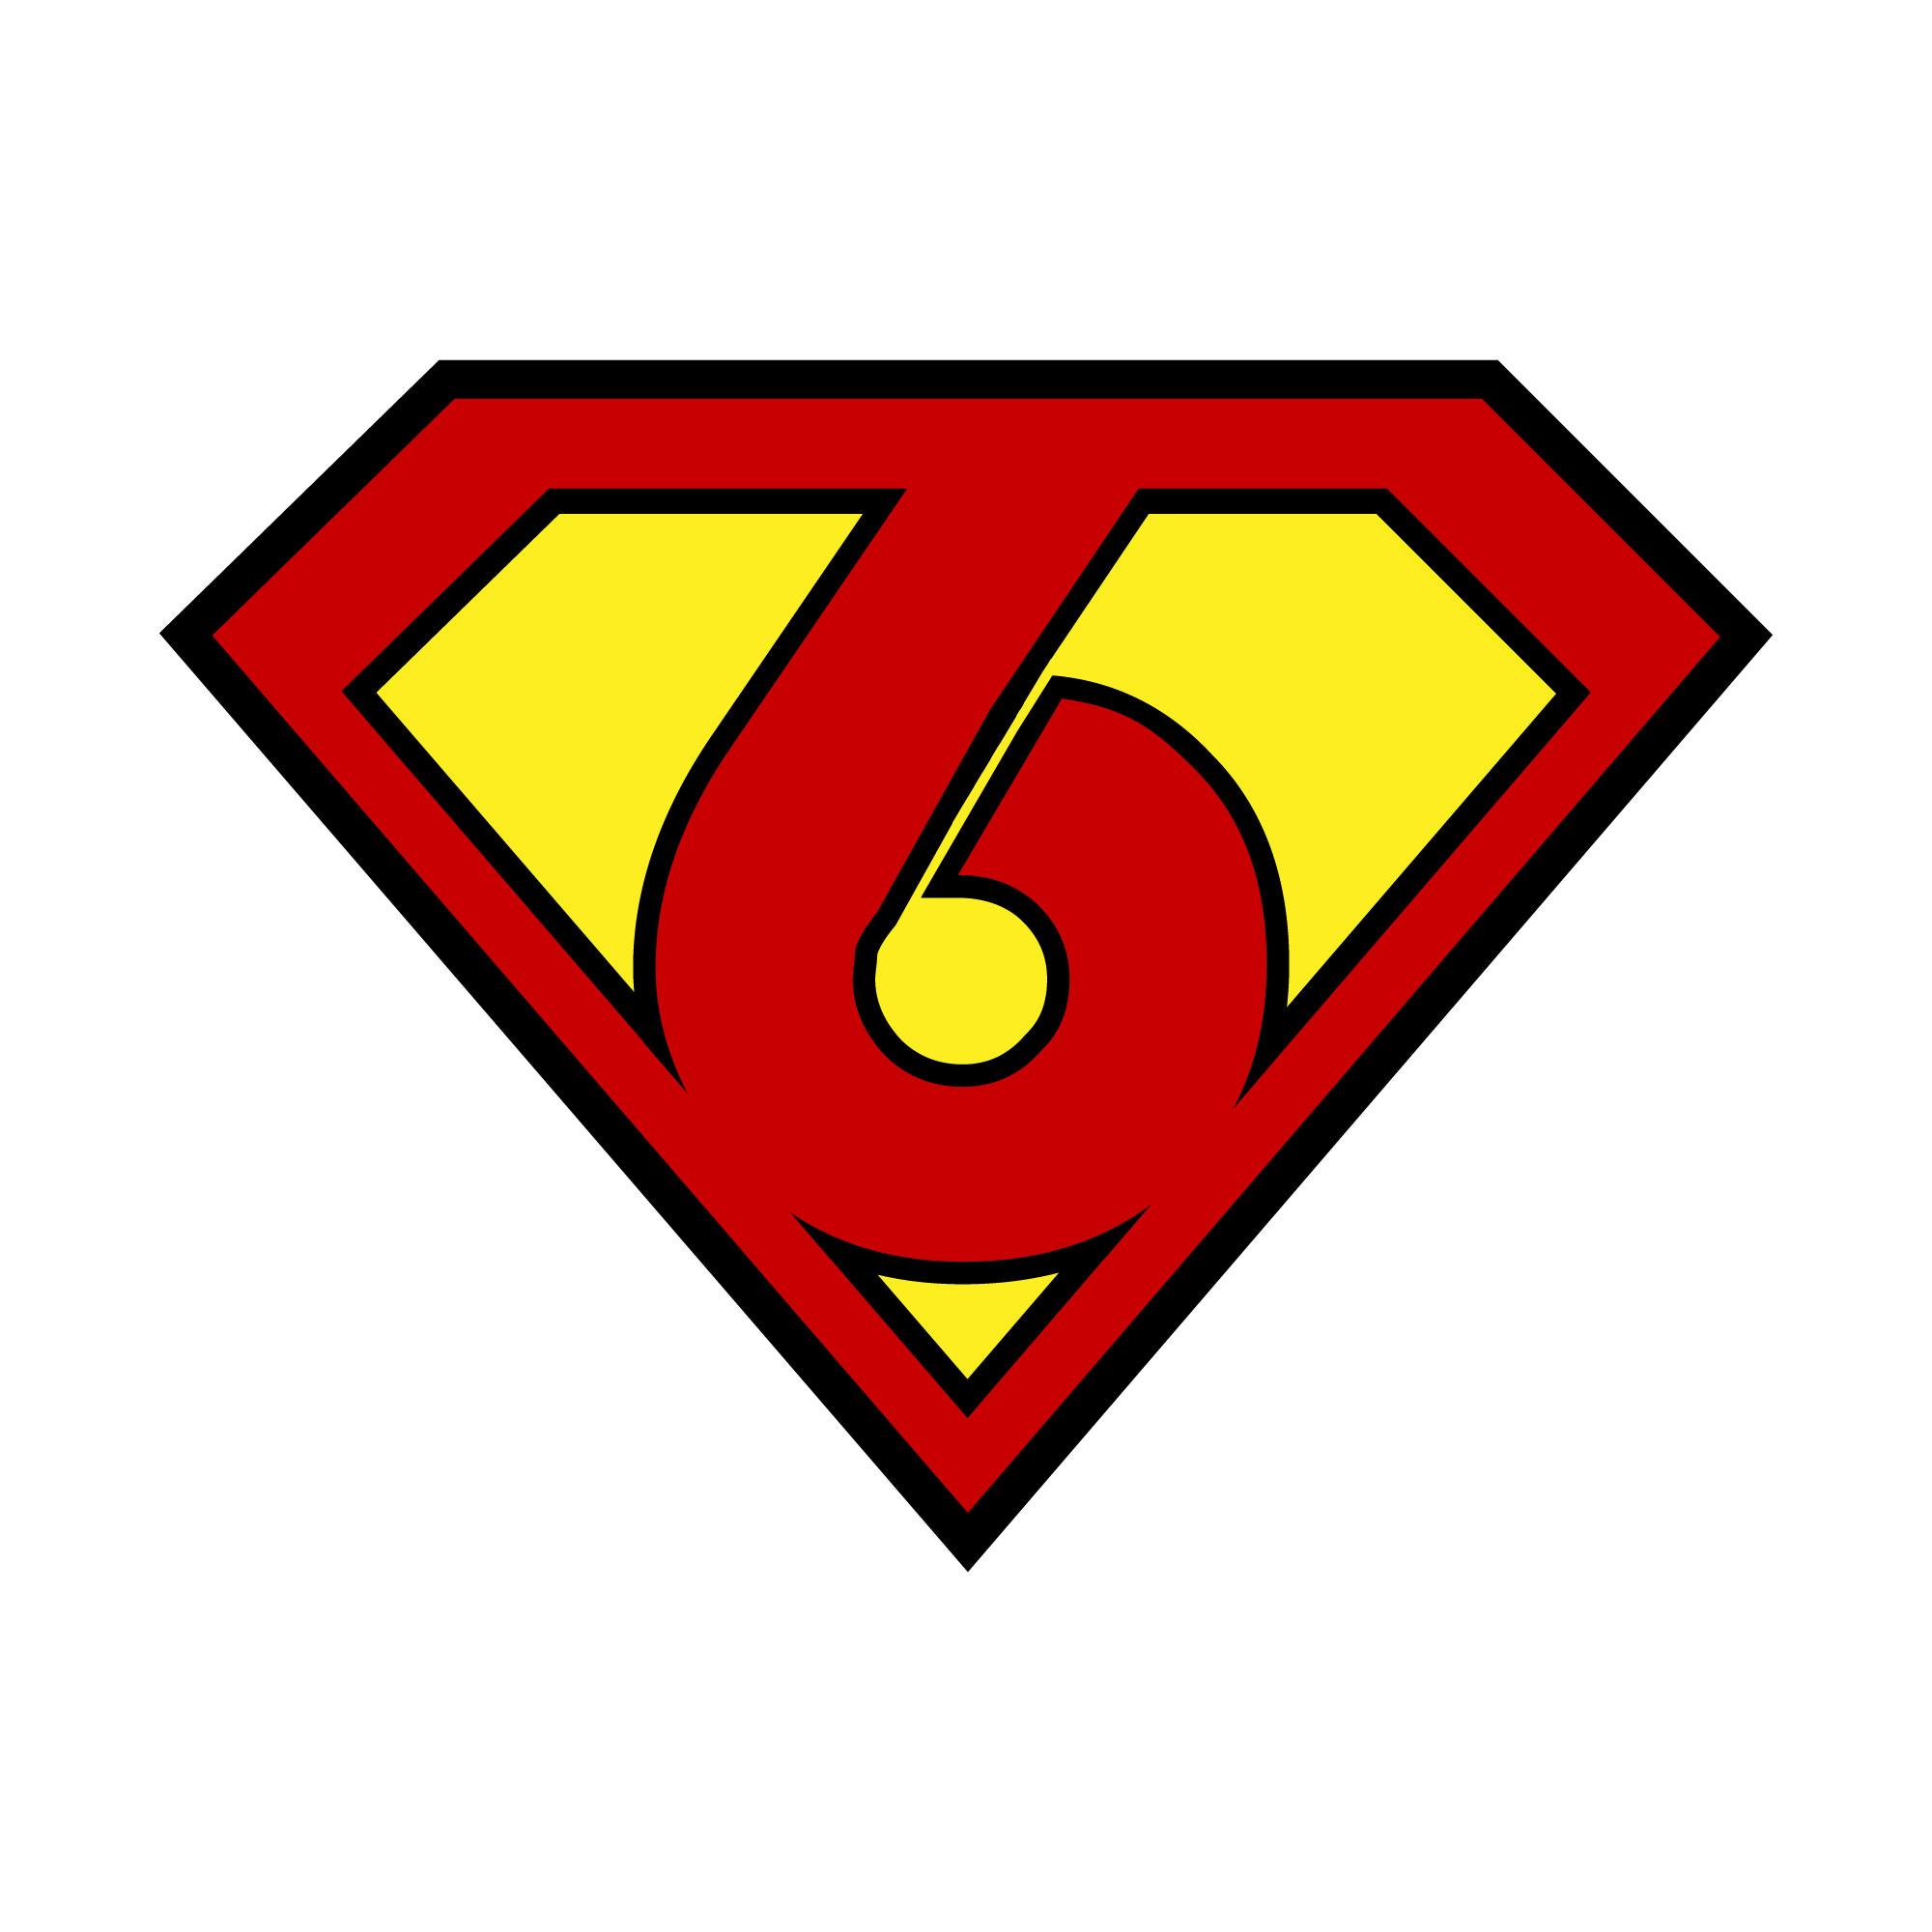 Super 6 Basketball